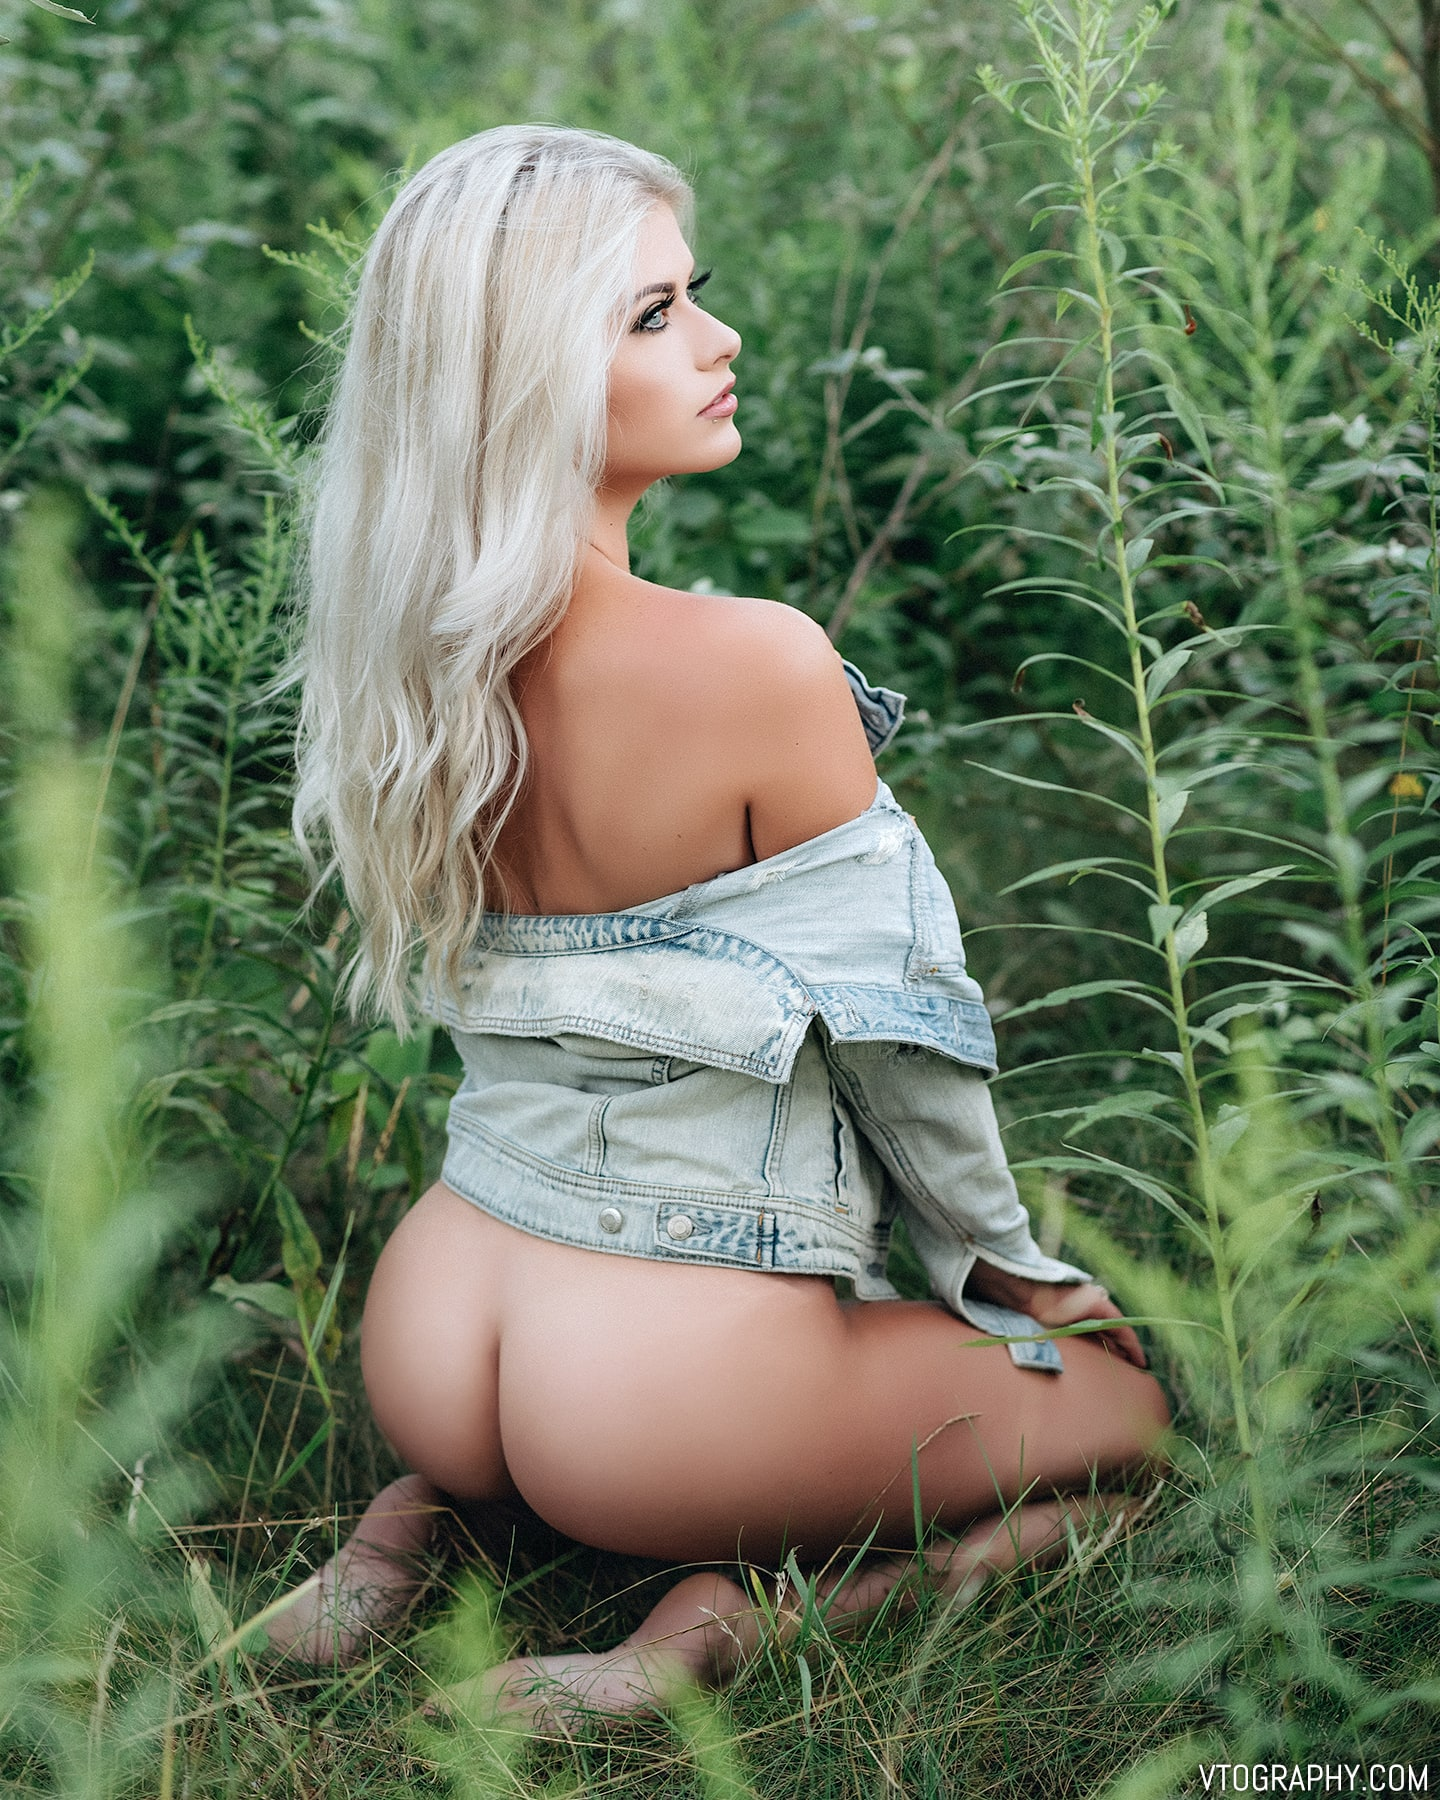 Nude Sami in a denim jacket